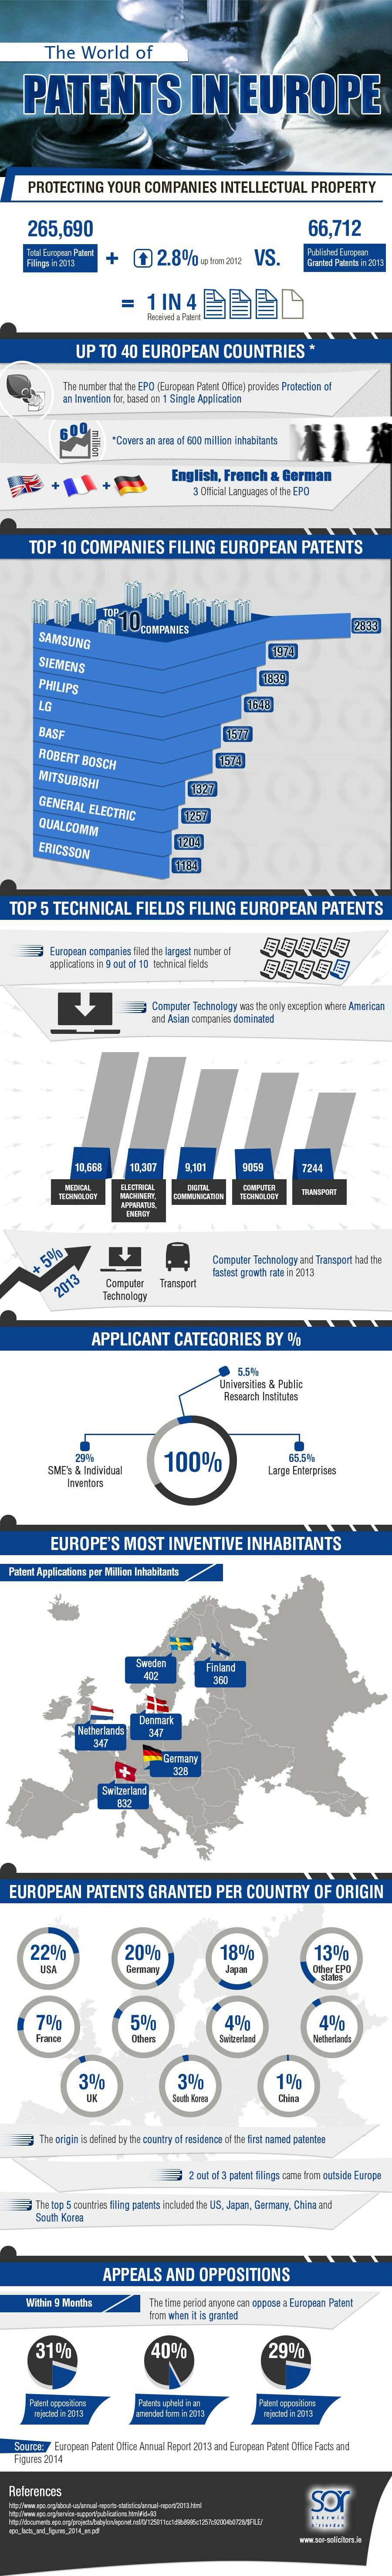 Patents-in-Europe.jpg